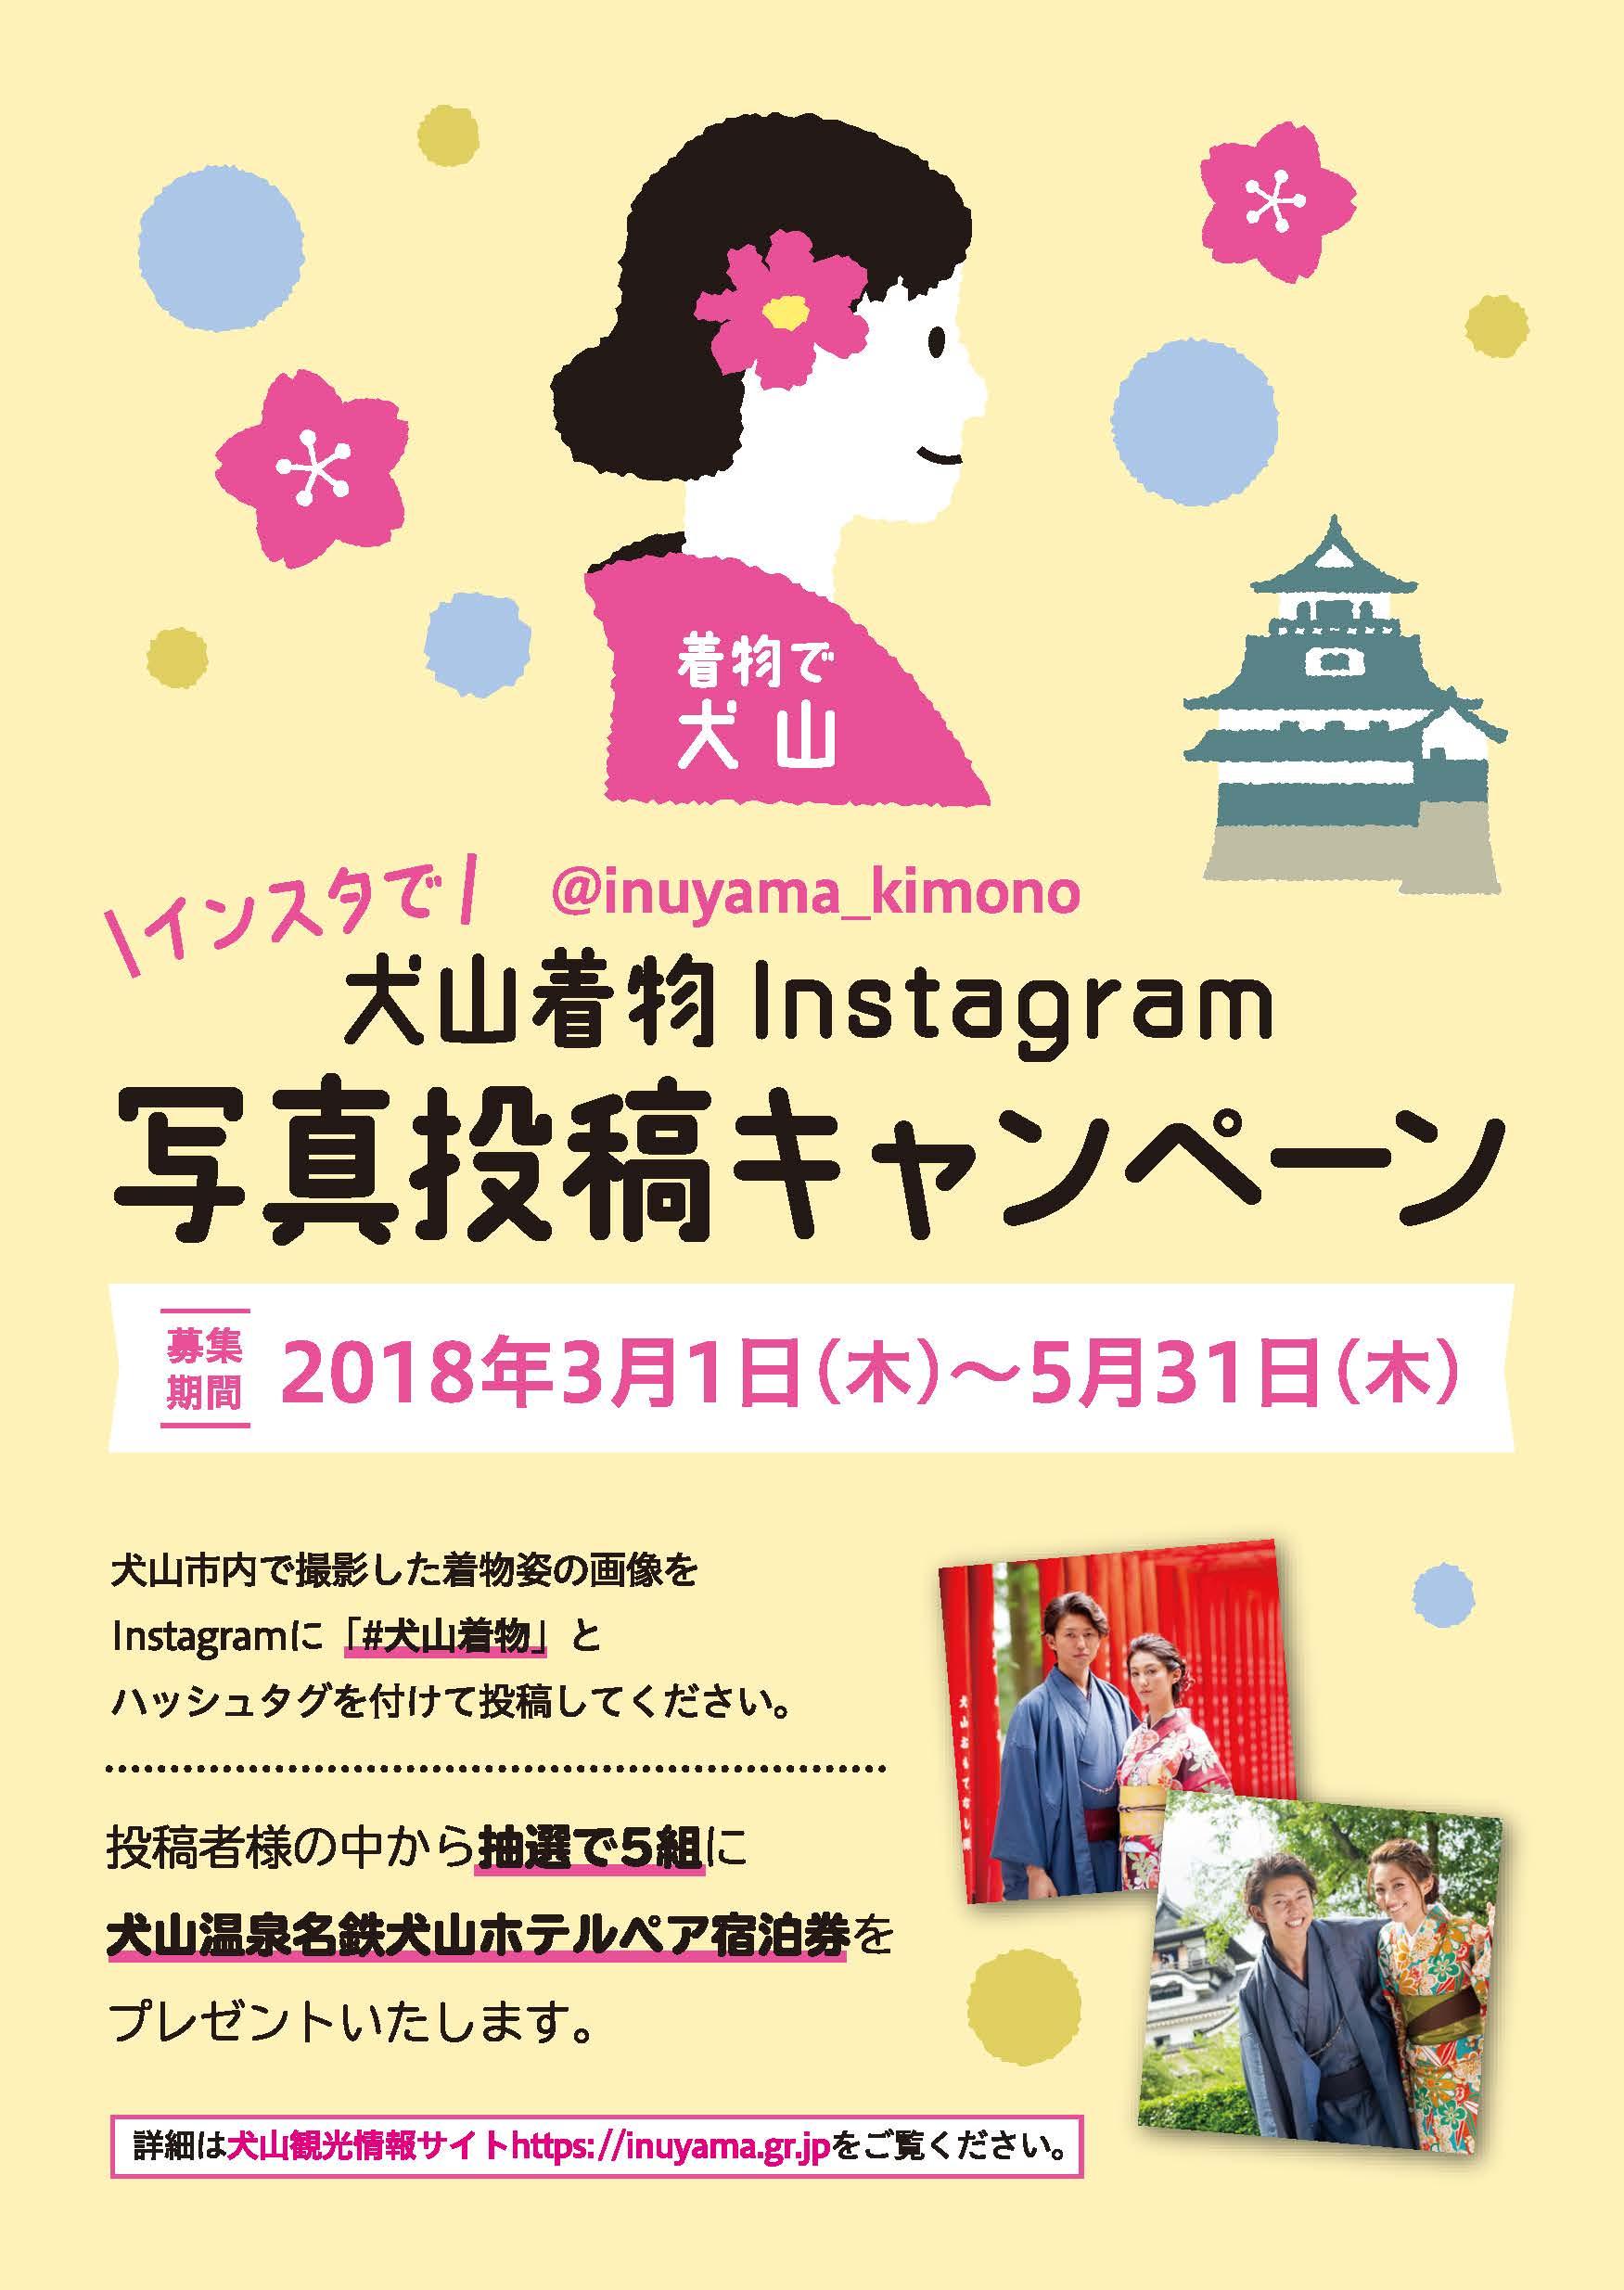 180107_kimono_instagram_ページ_1